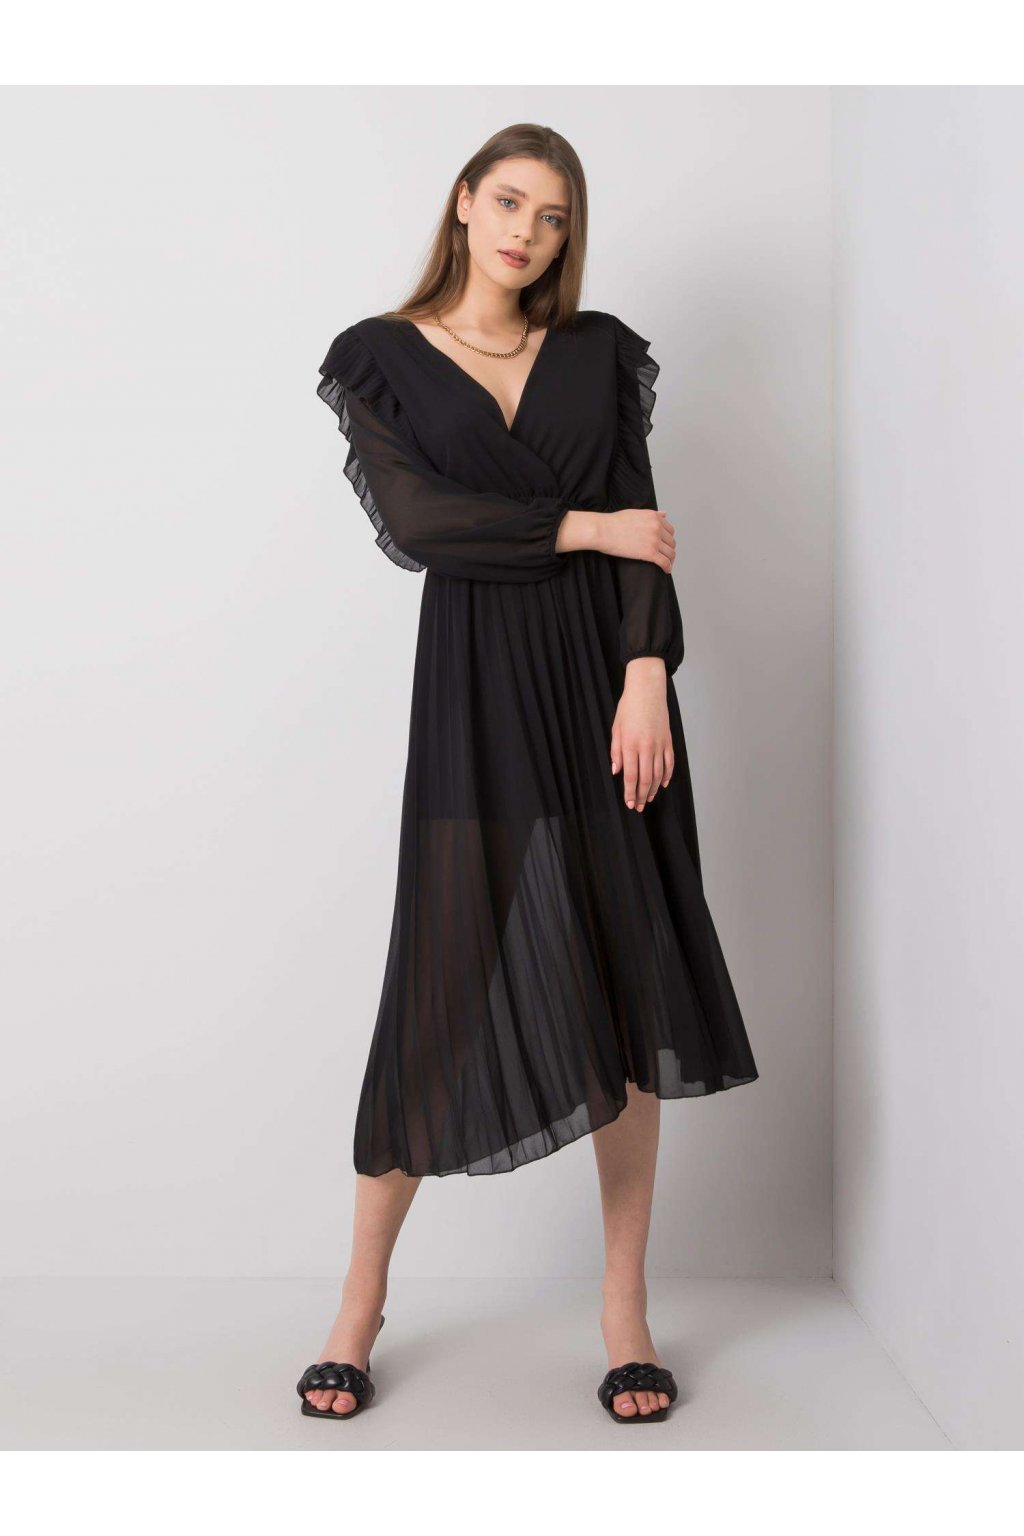 pol pl Czarna sukienka Frankie 362578 1